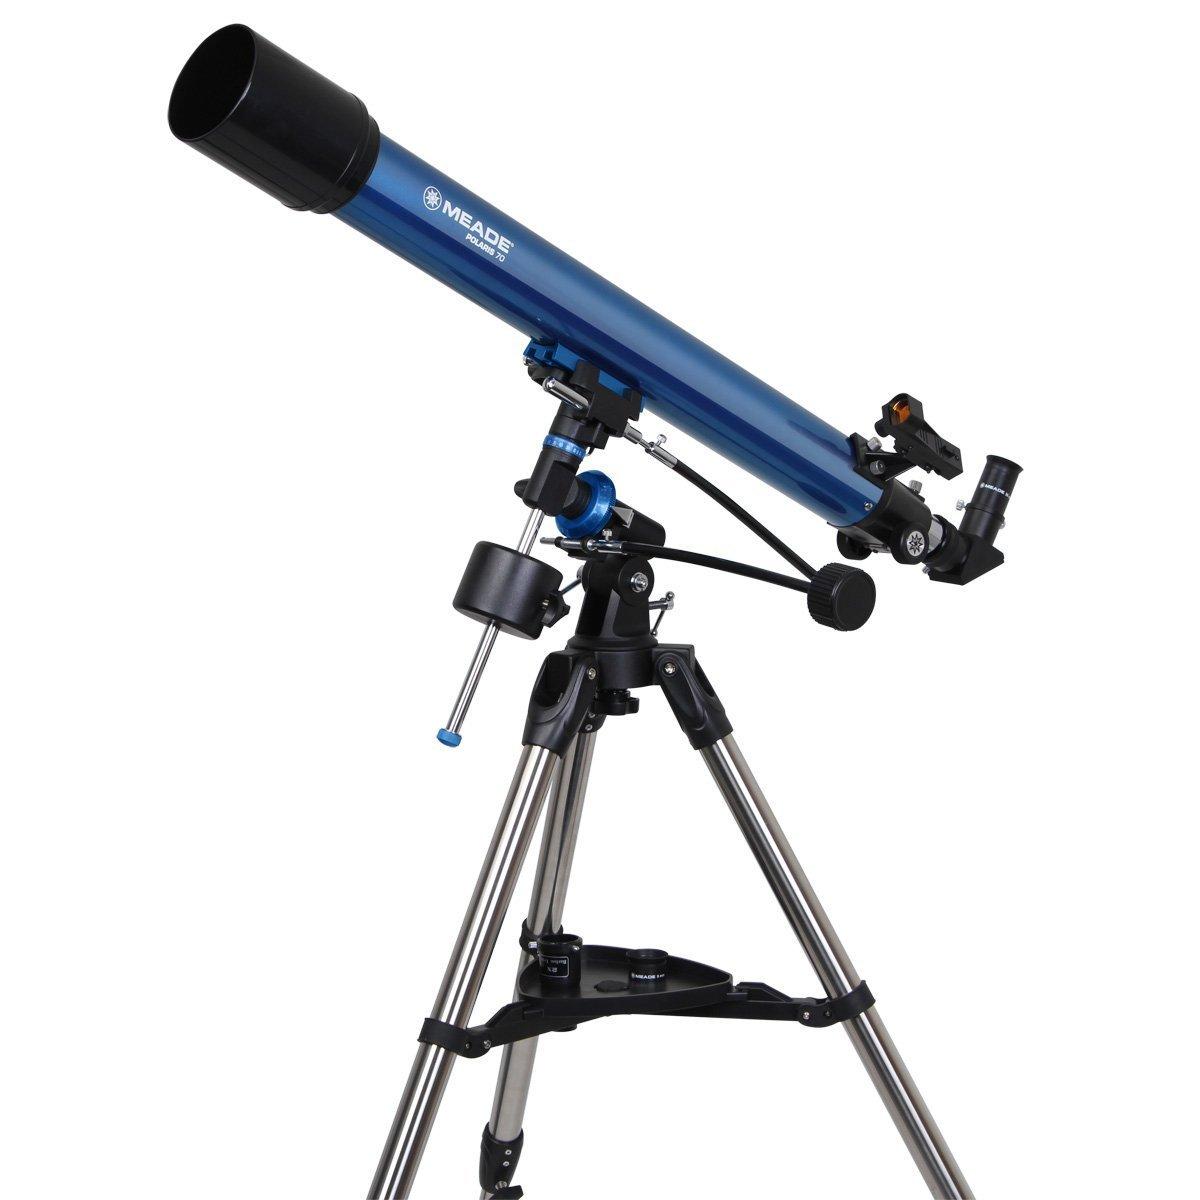 Ascension Eyepiece Projection Kit UK